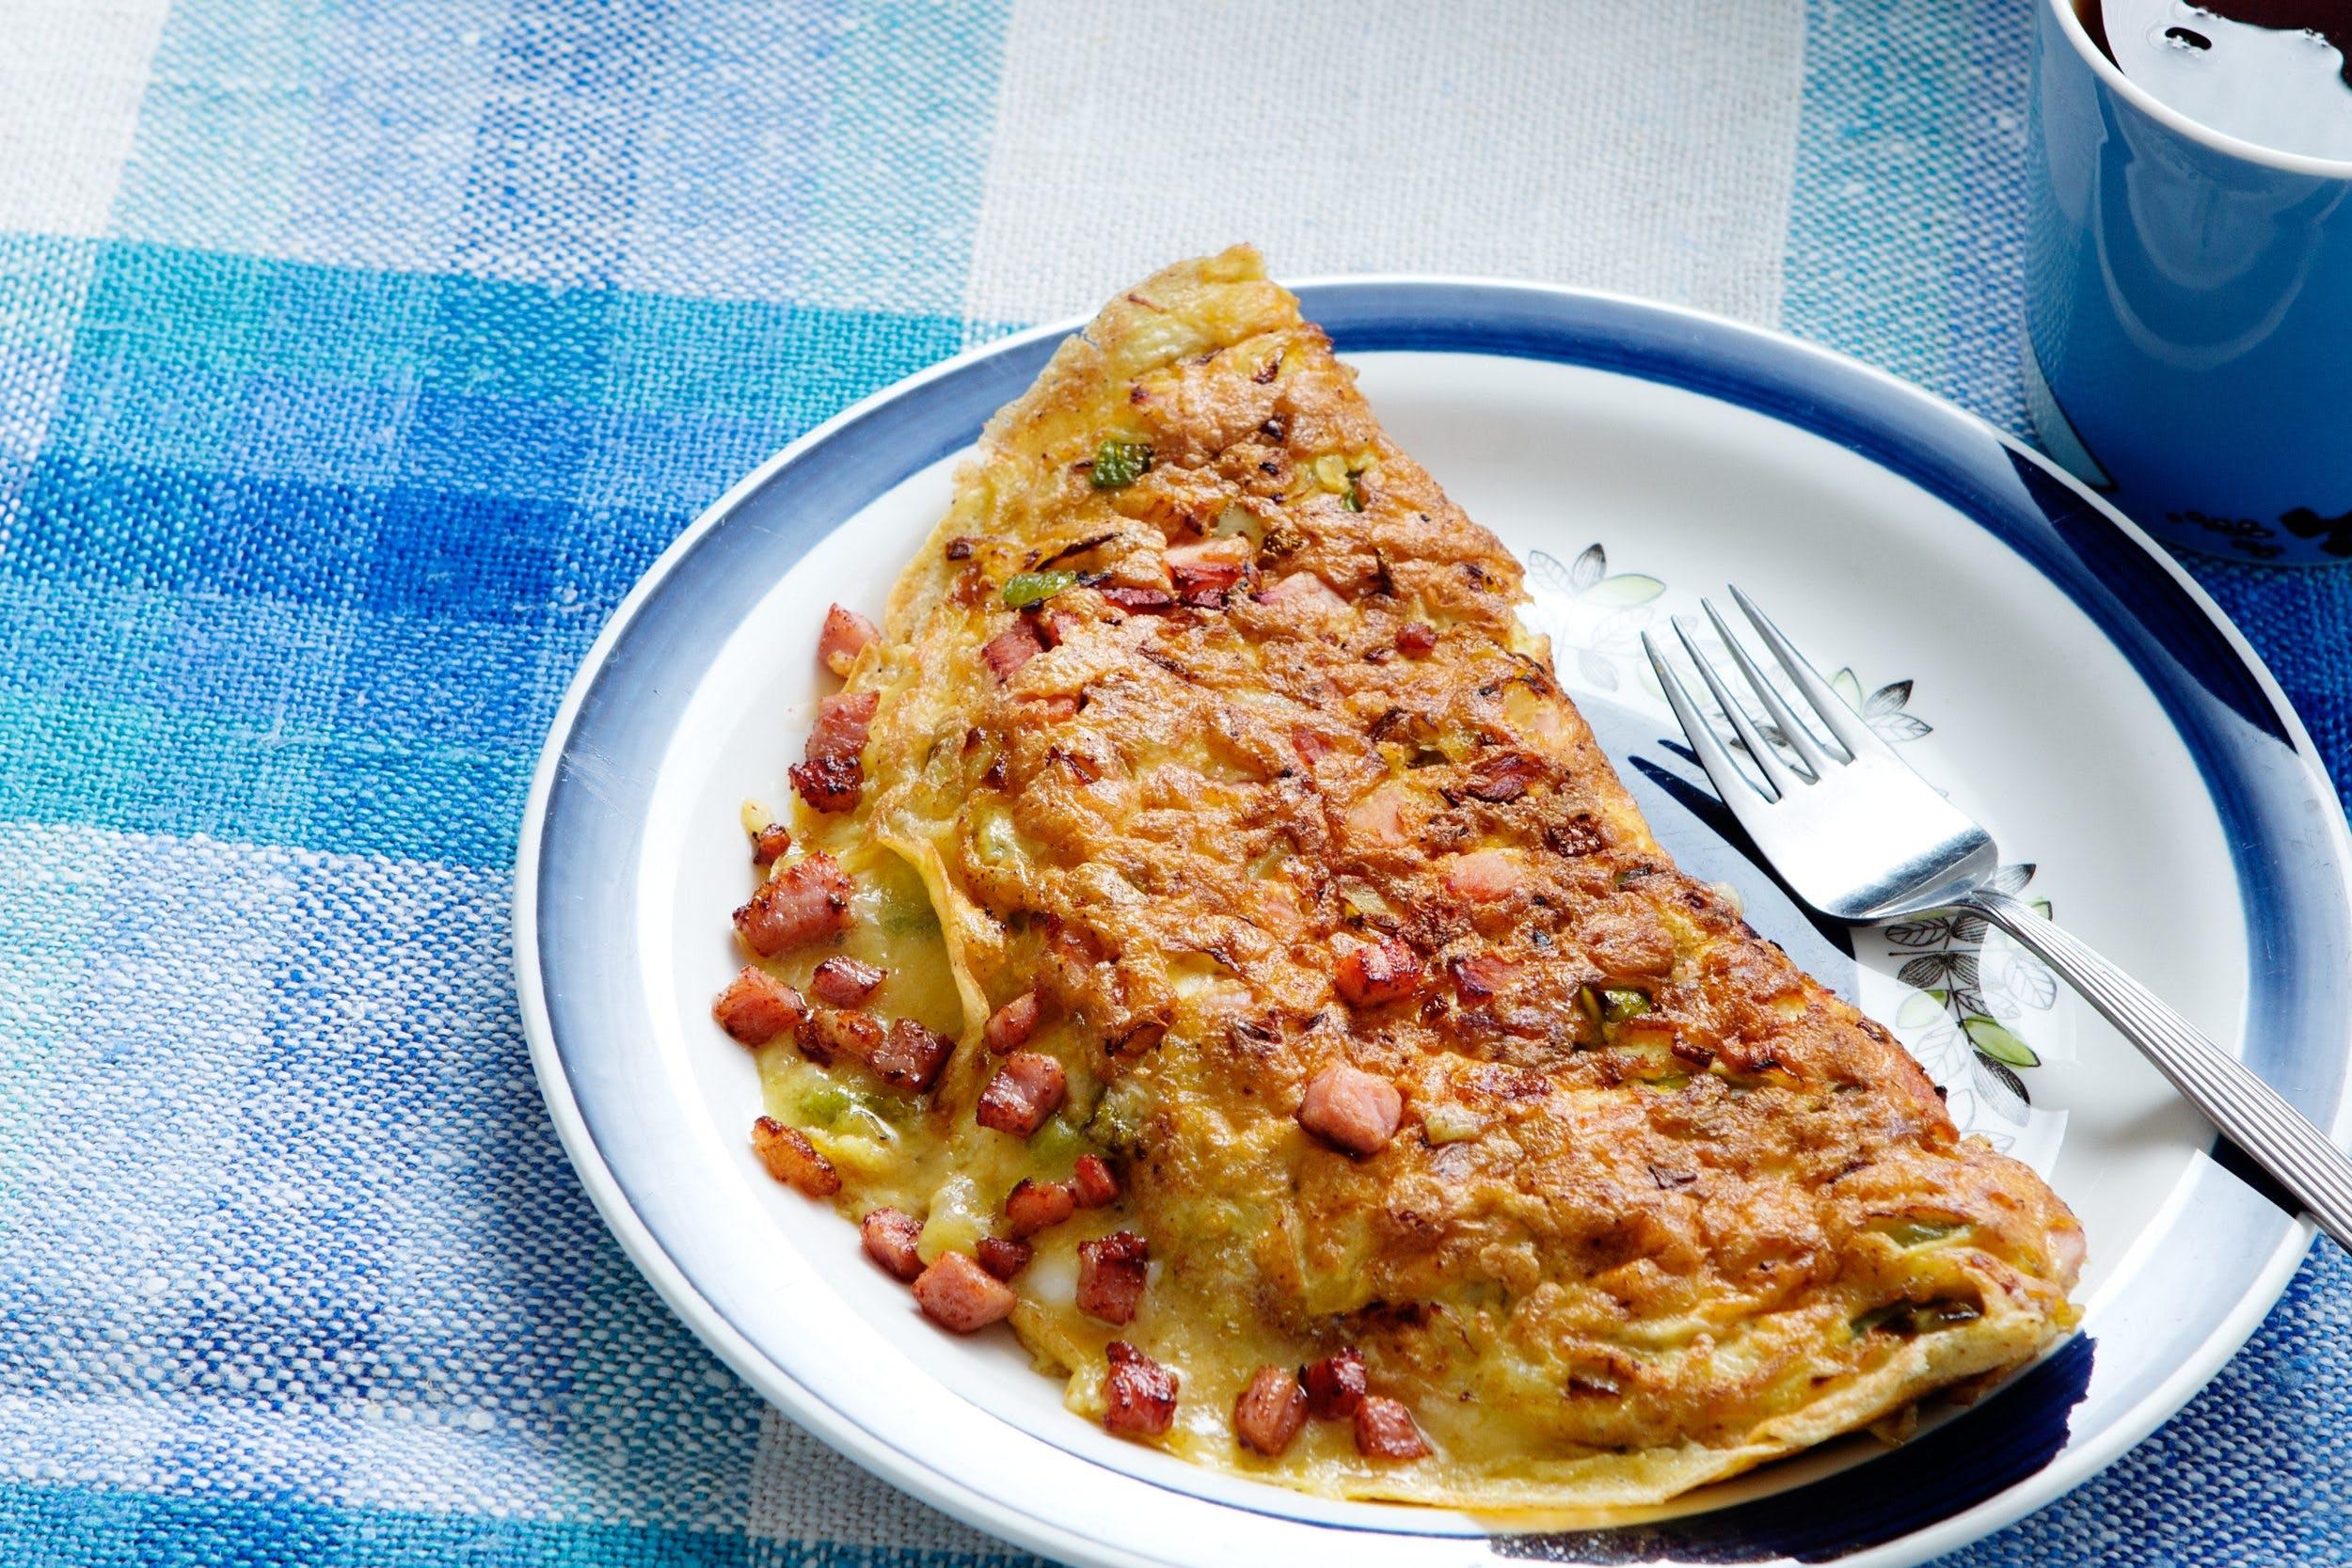 Keto western omelet